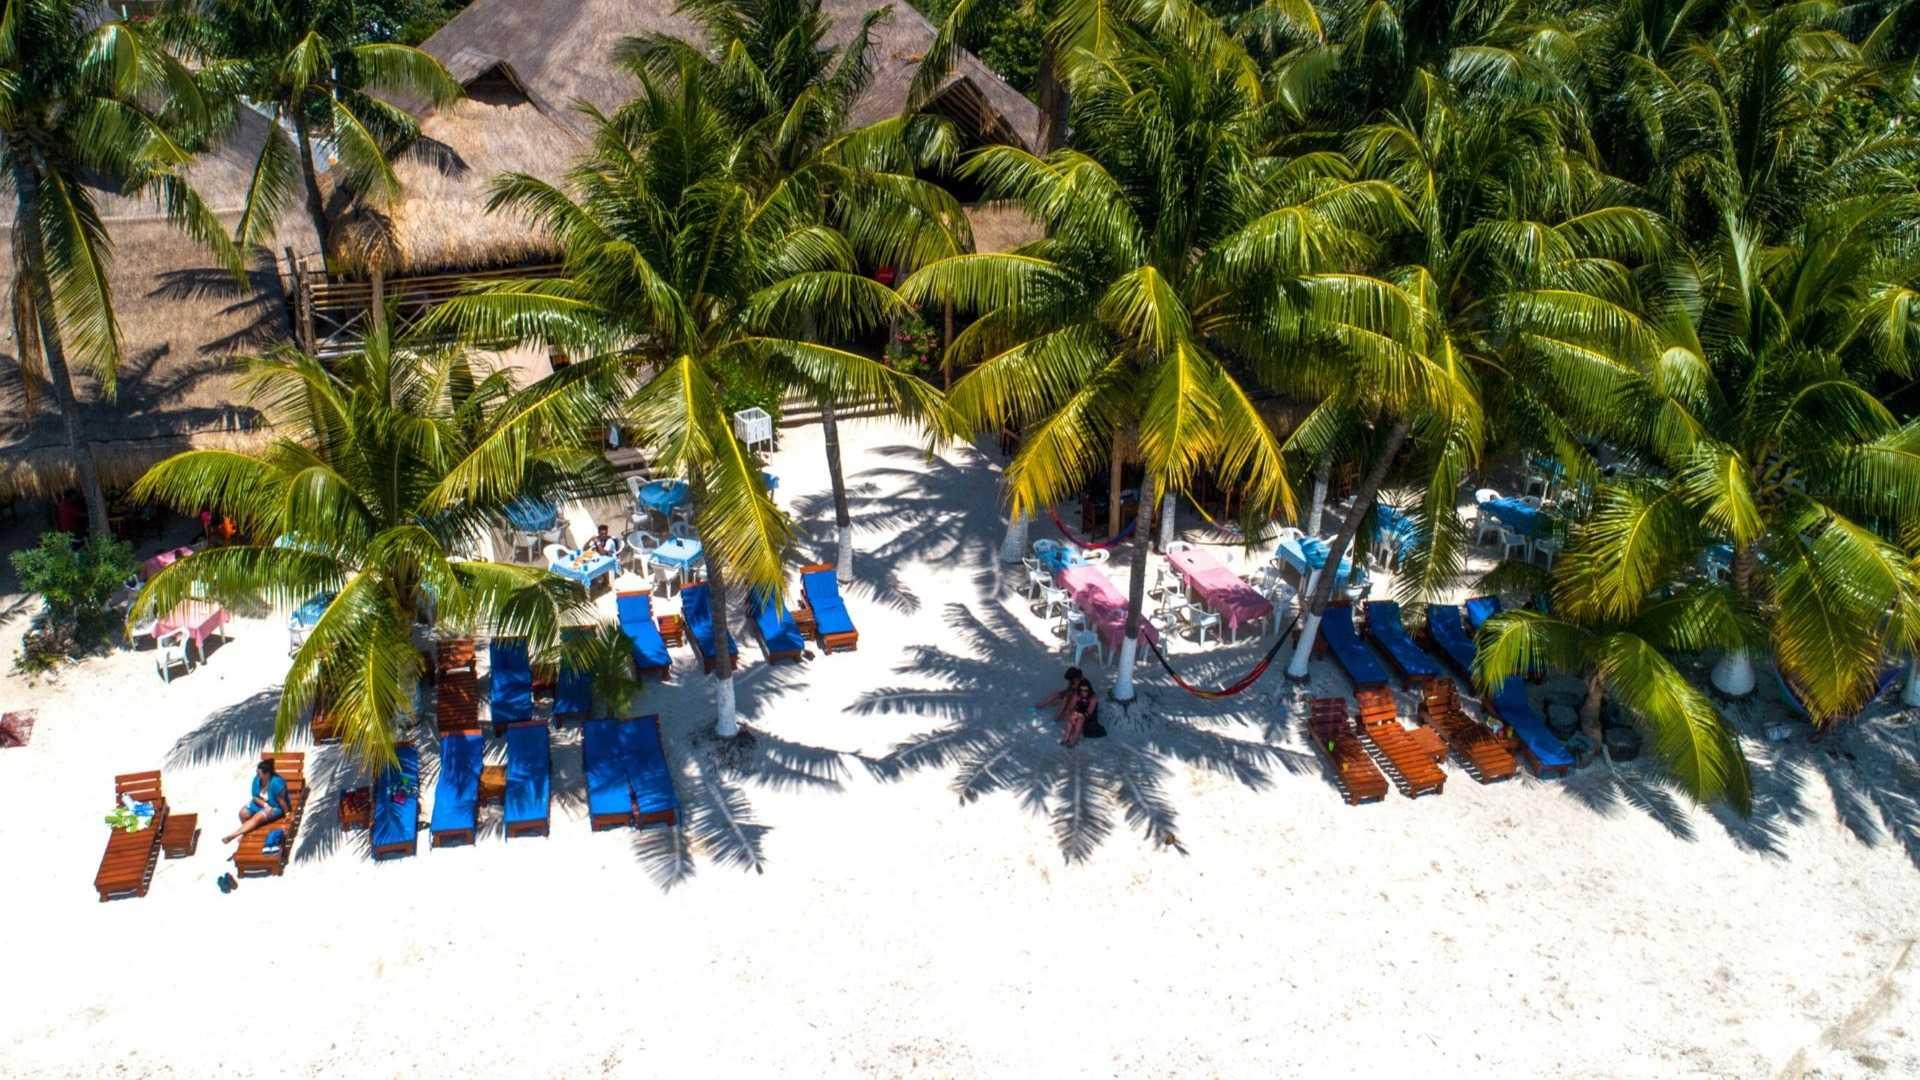 02 - Beach club - Playa Mexico - Ice Bar Isla Mujeres - Beach front